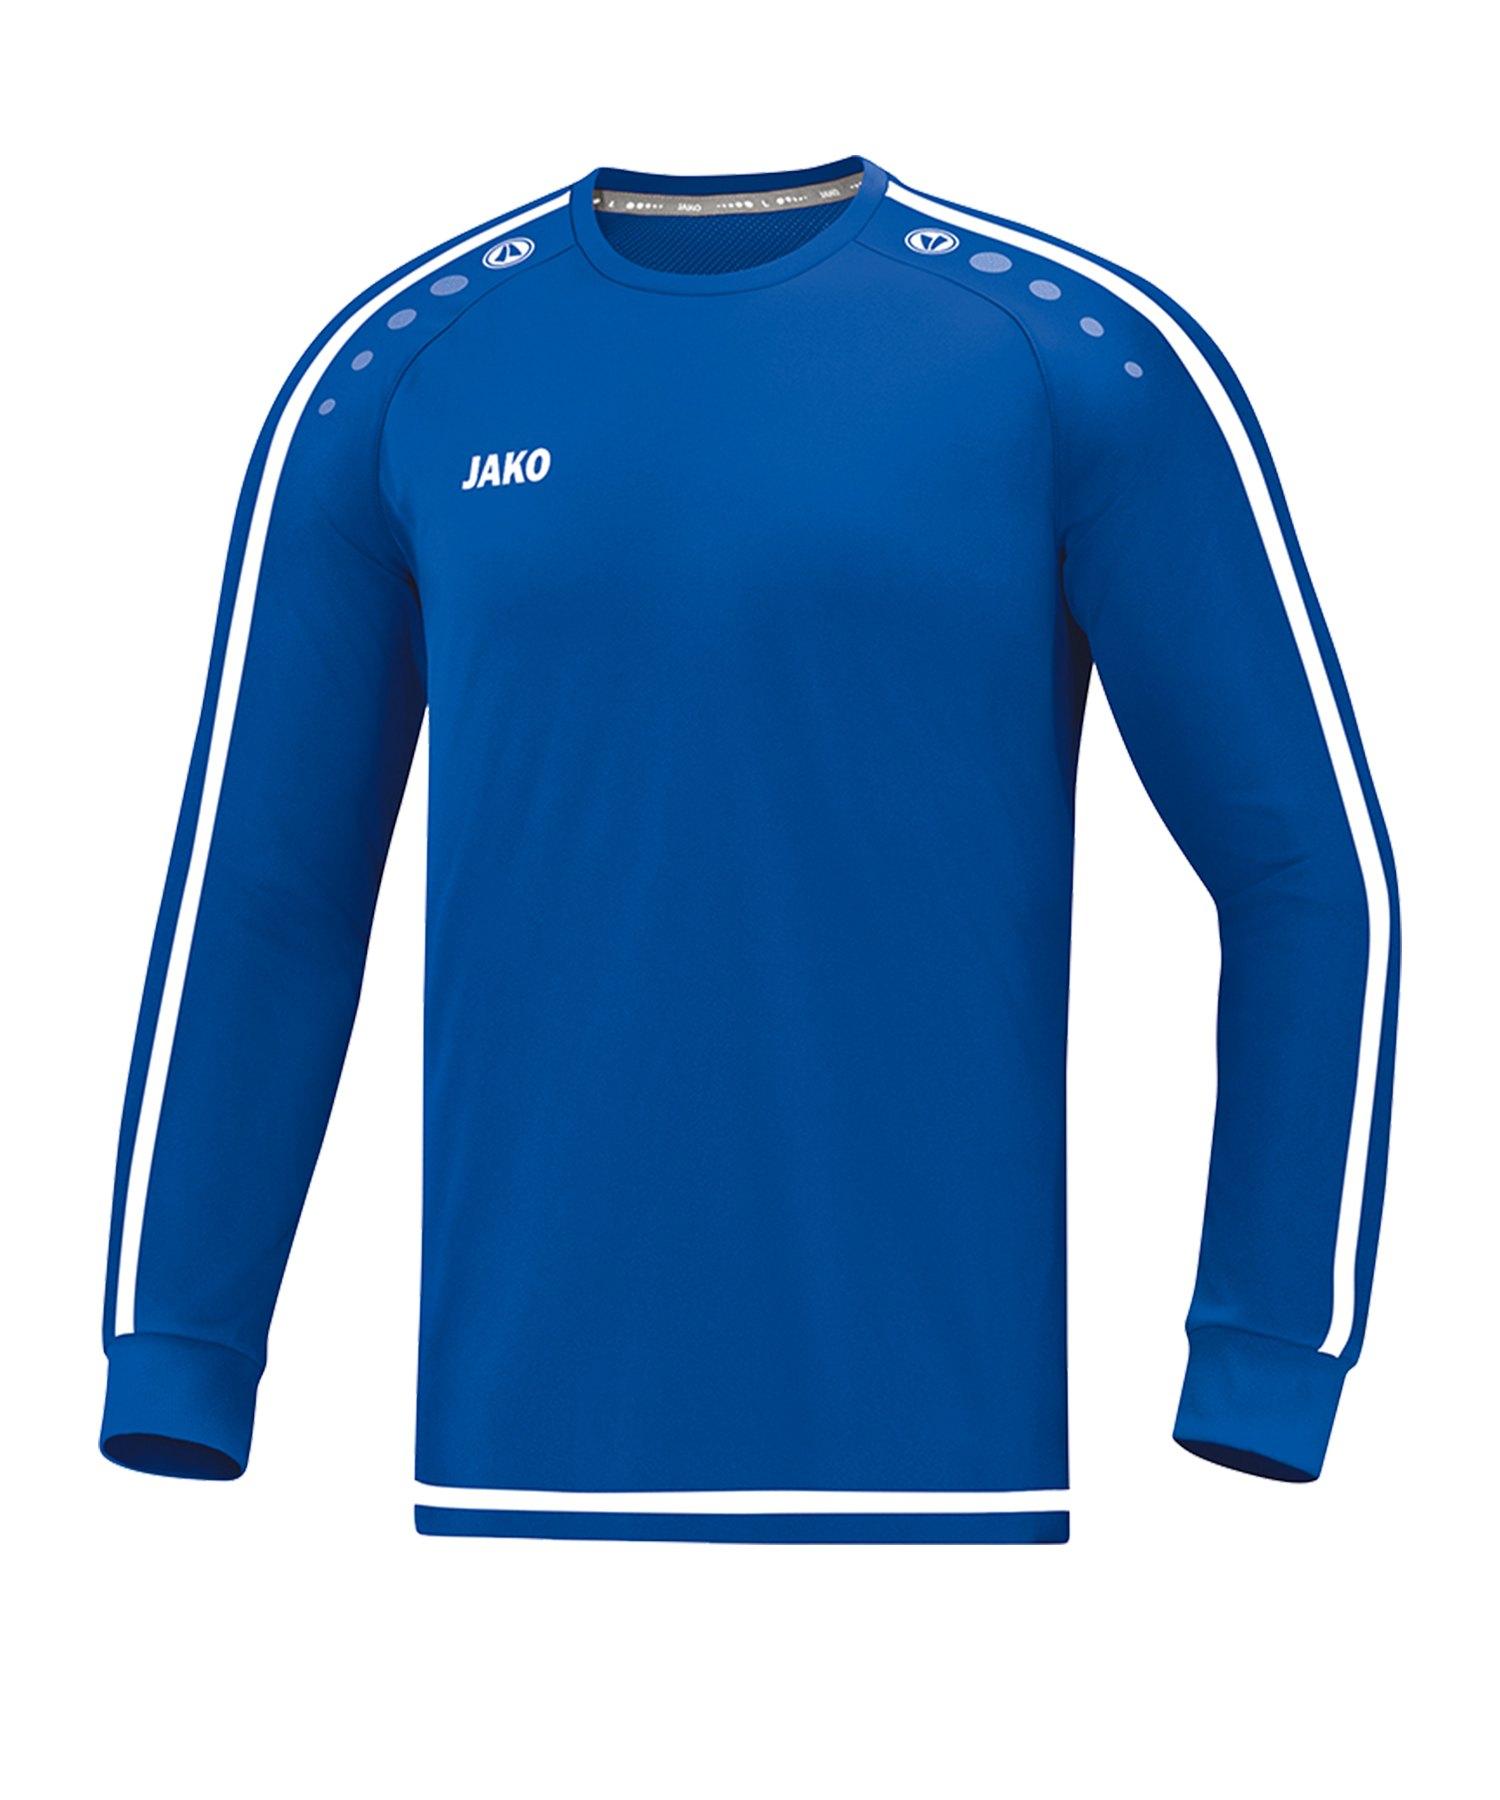 Jako Striker 2.0 Trikot langarm Kids Blau F04 - Blau